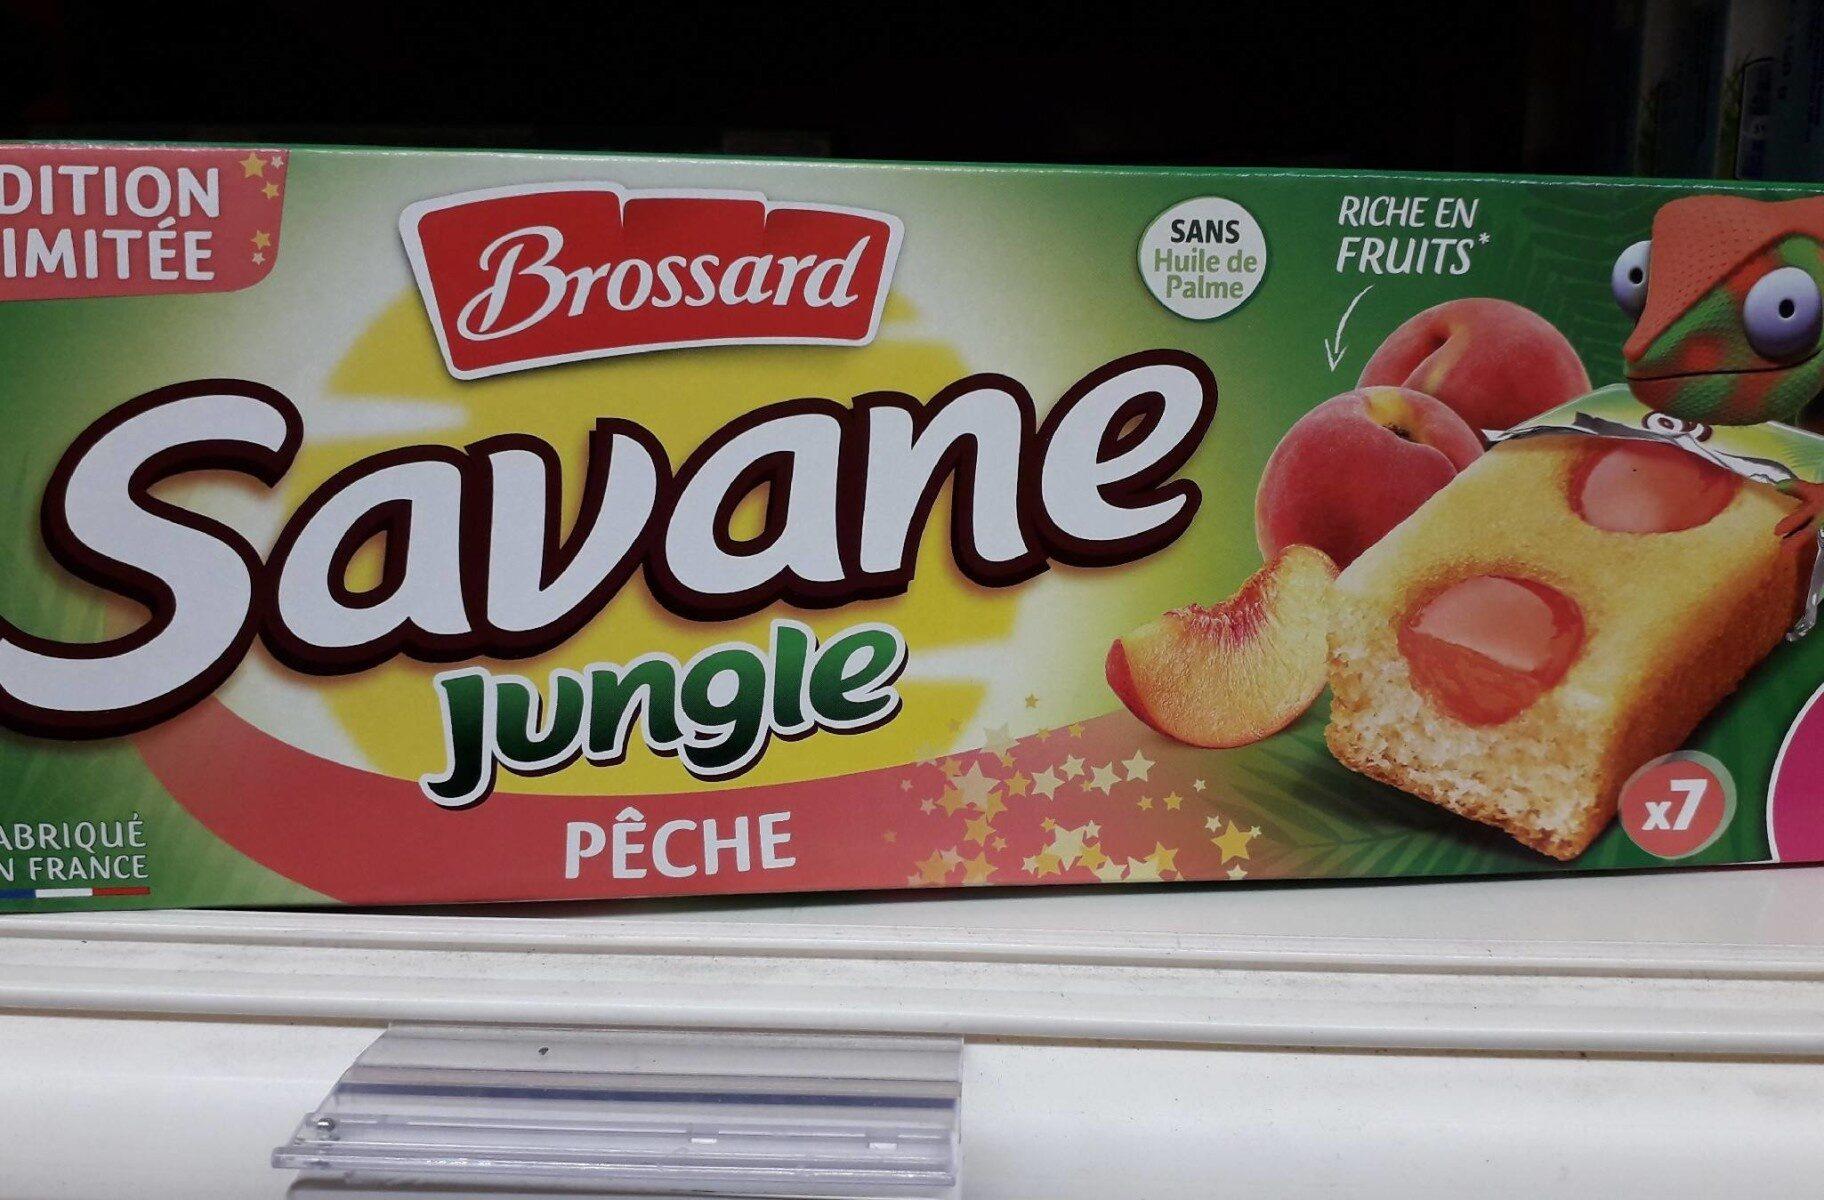 Savane jungle pêche - Produit - fr